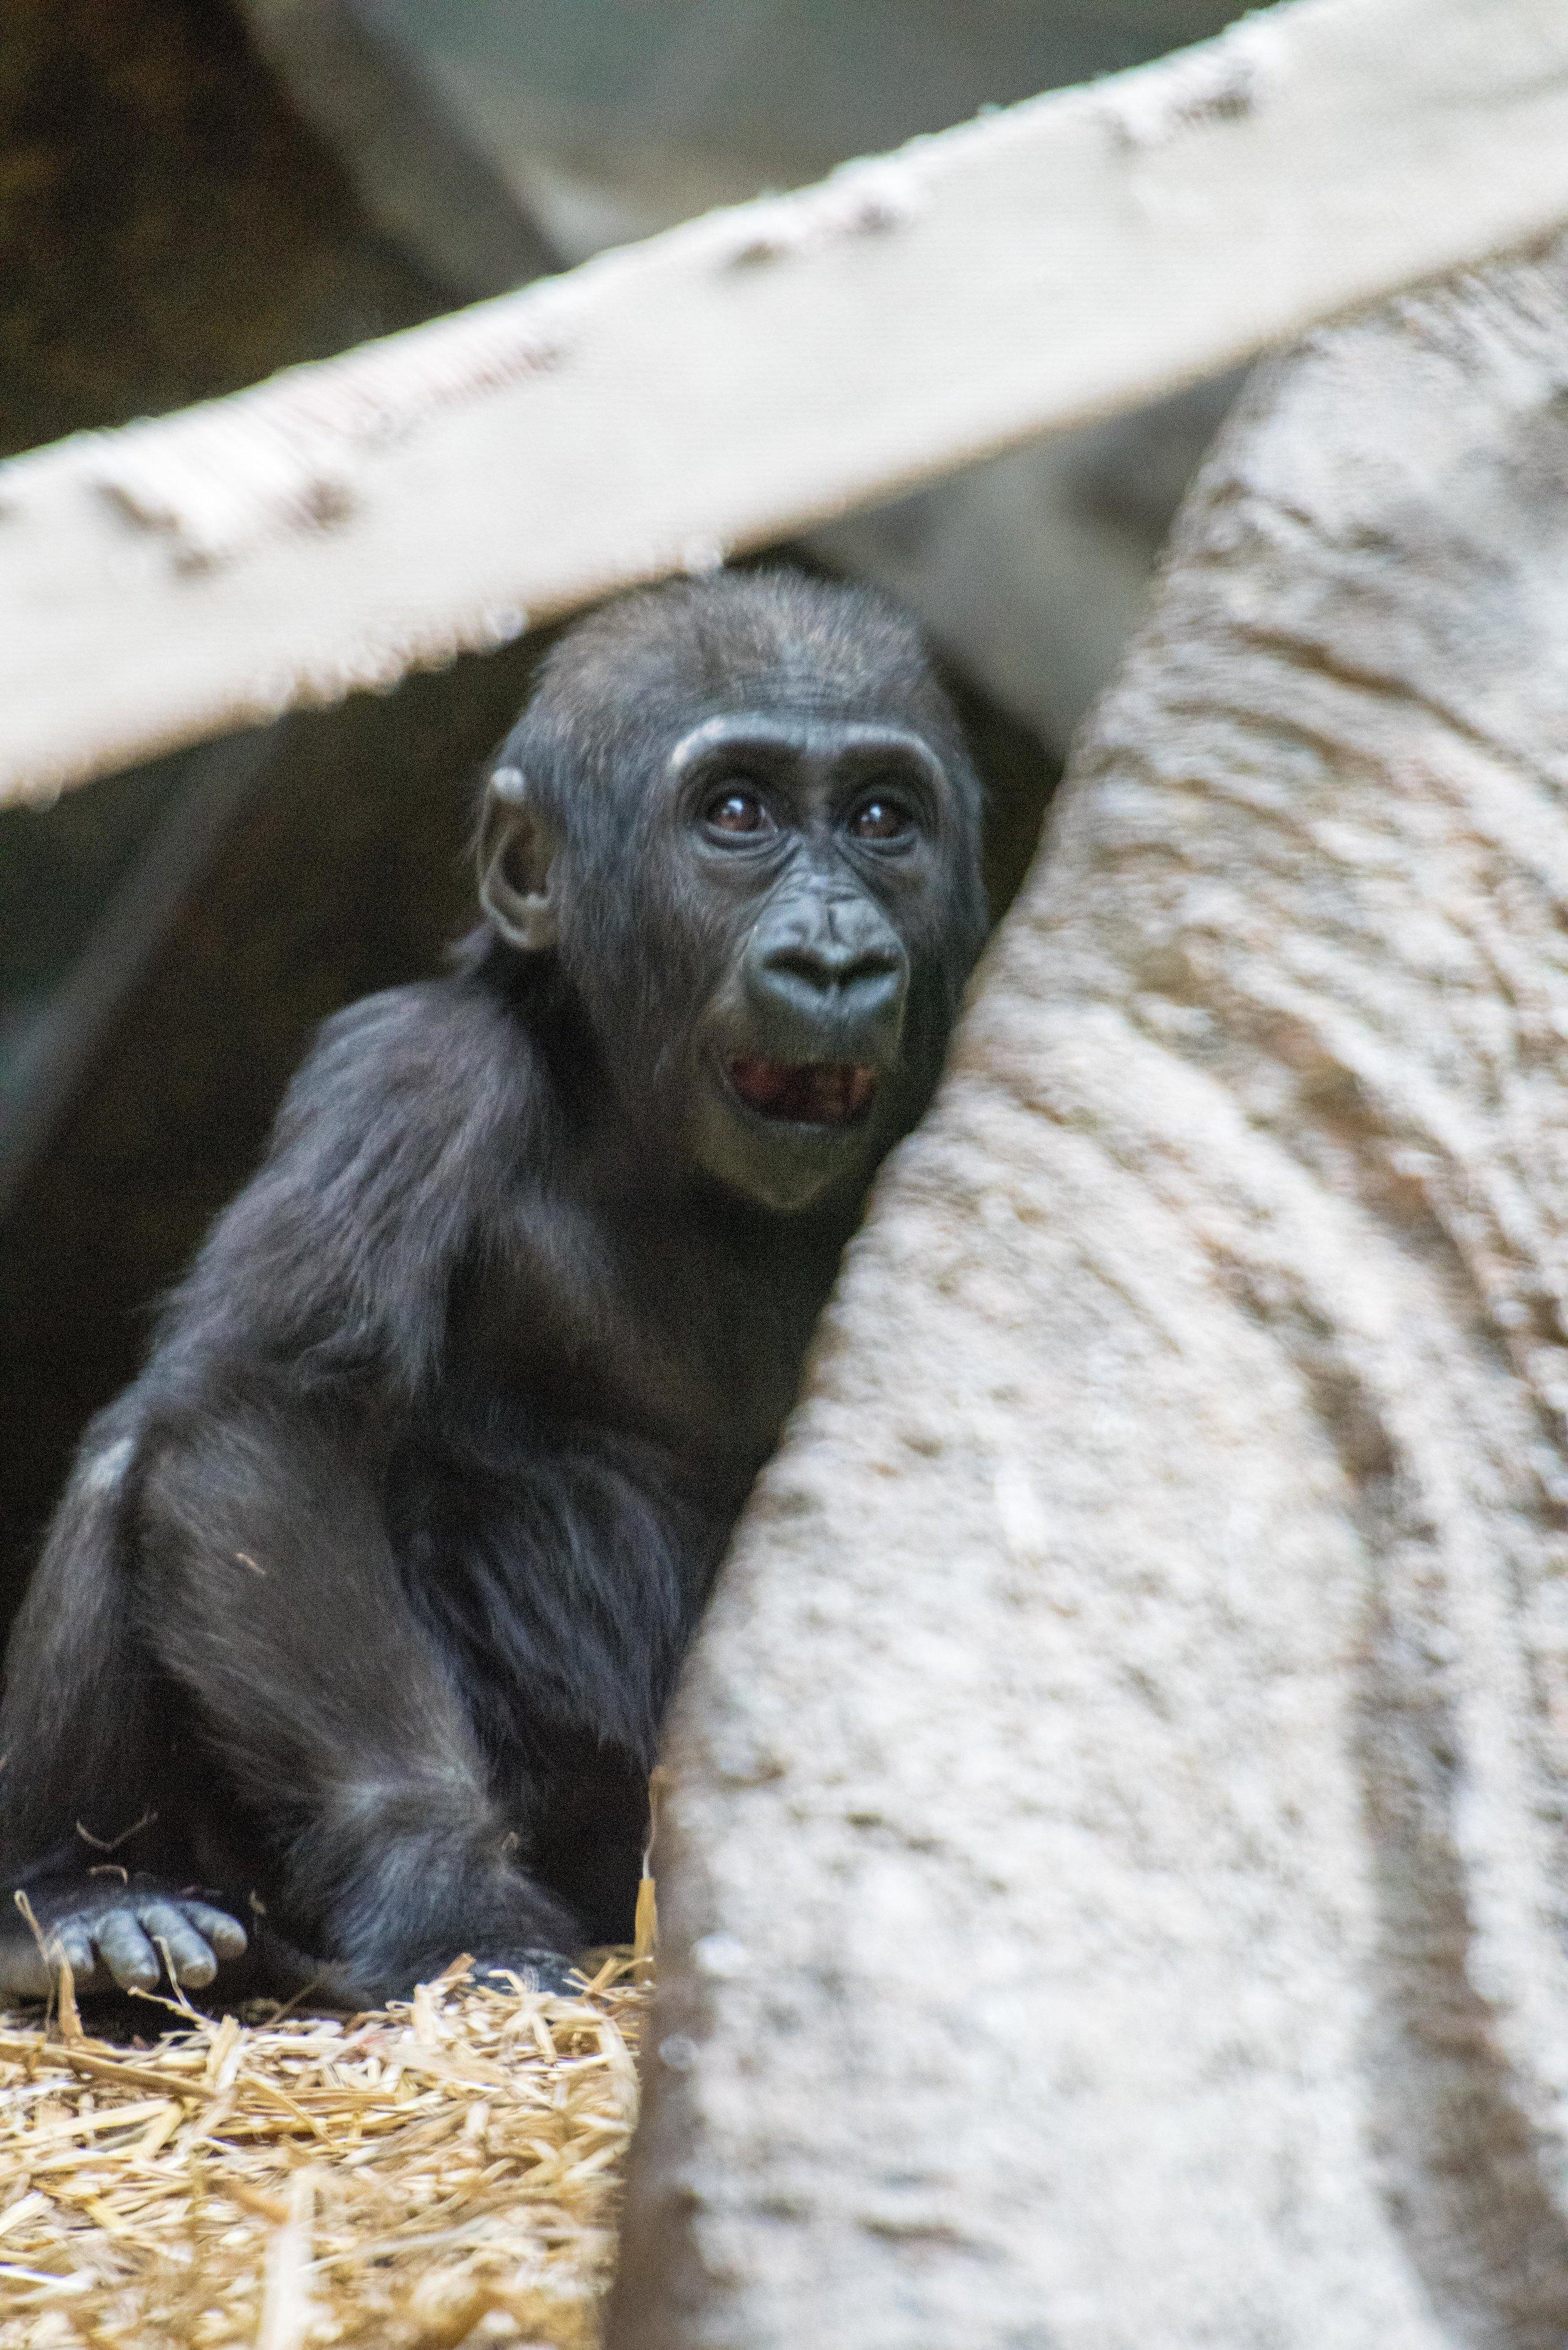 calgary zoo-3692.jpg